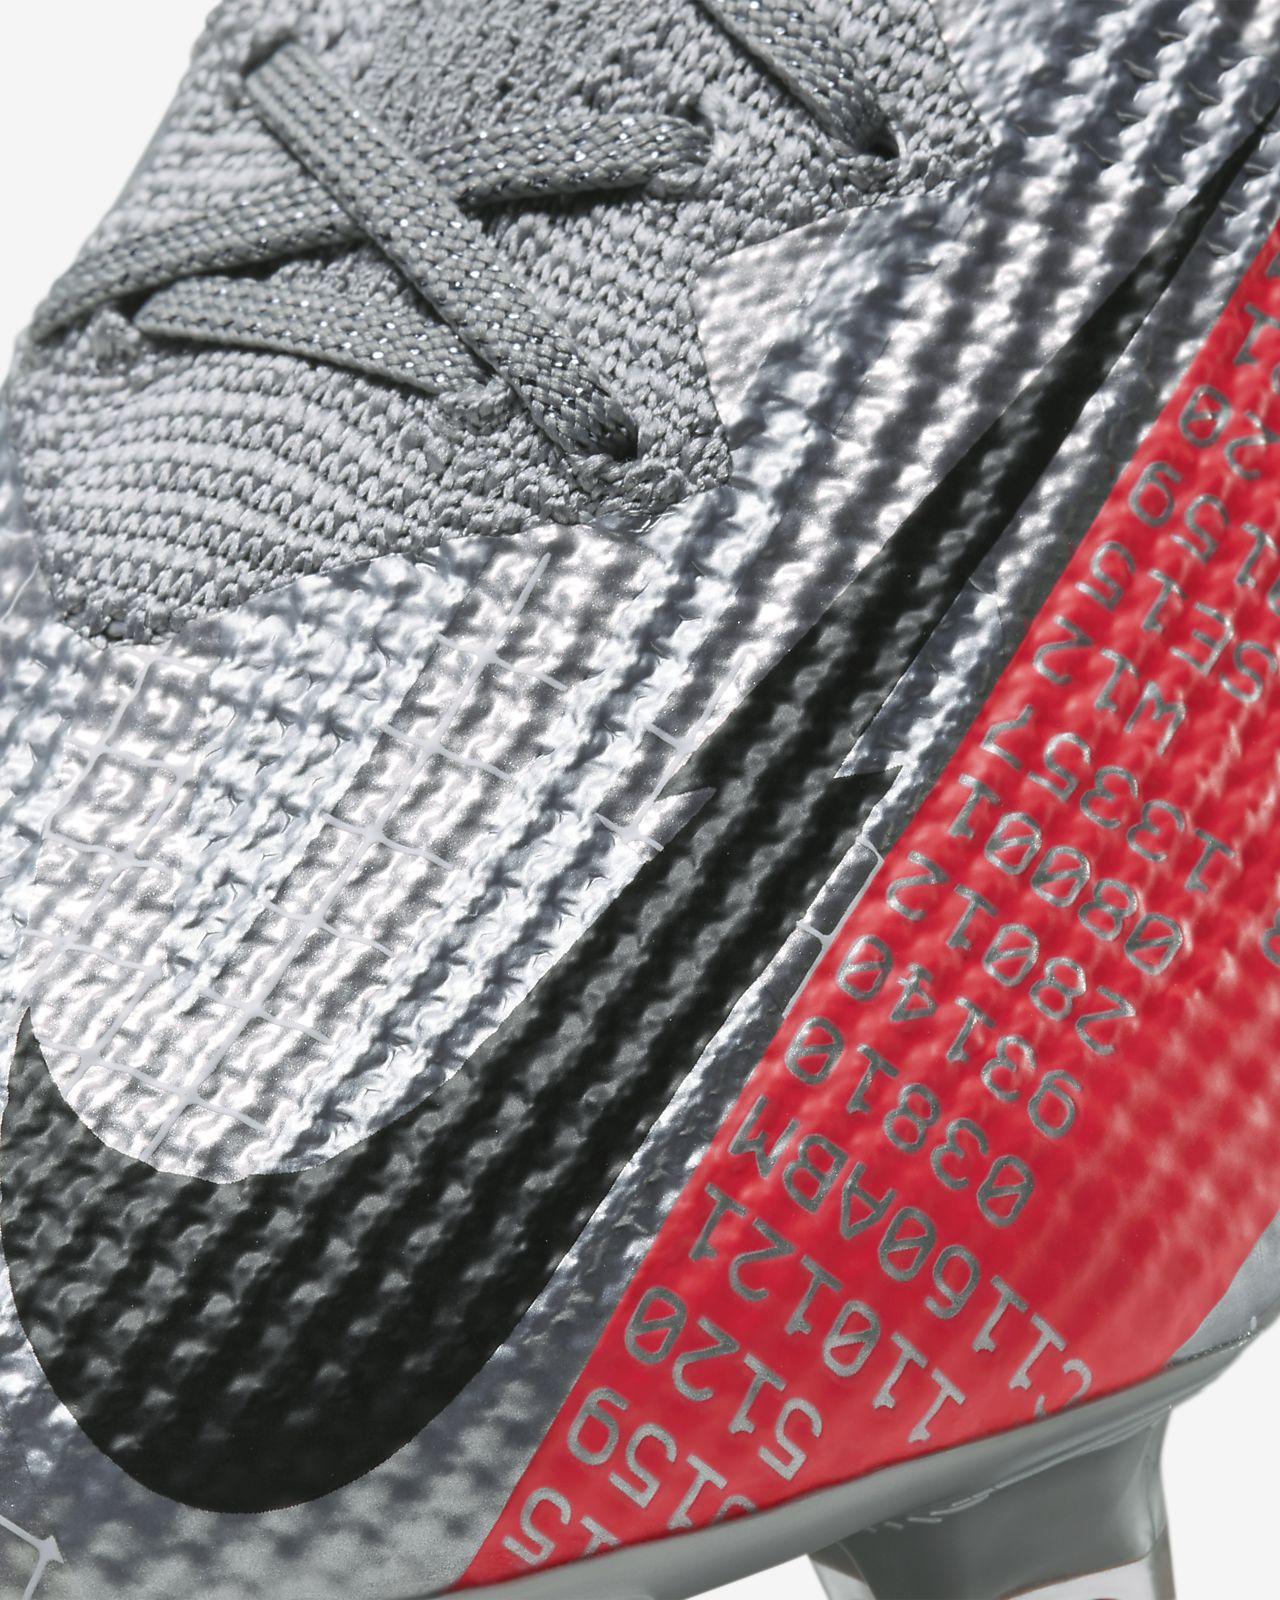 Nike mercurial cr7 niño multitaco 77% descuento www .